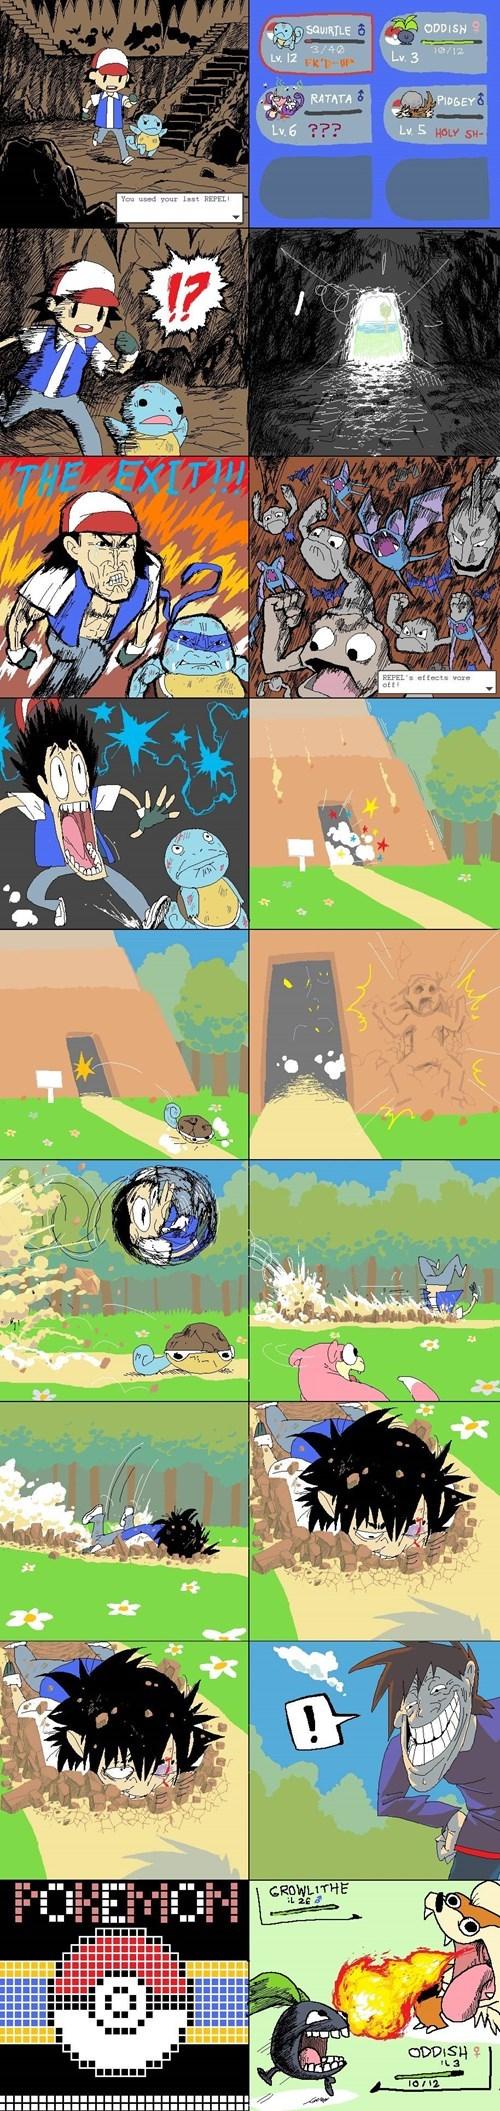 Pokémon,gary oak,web comics